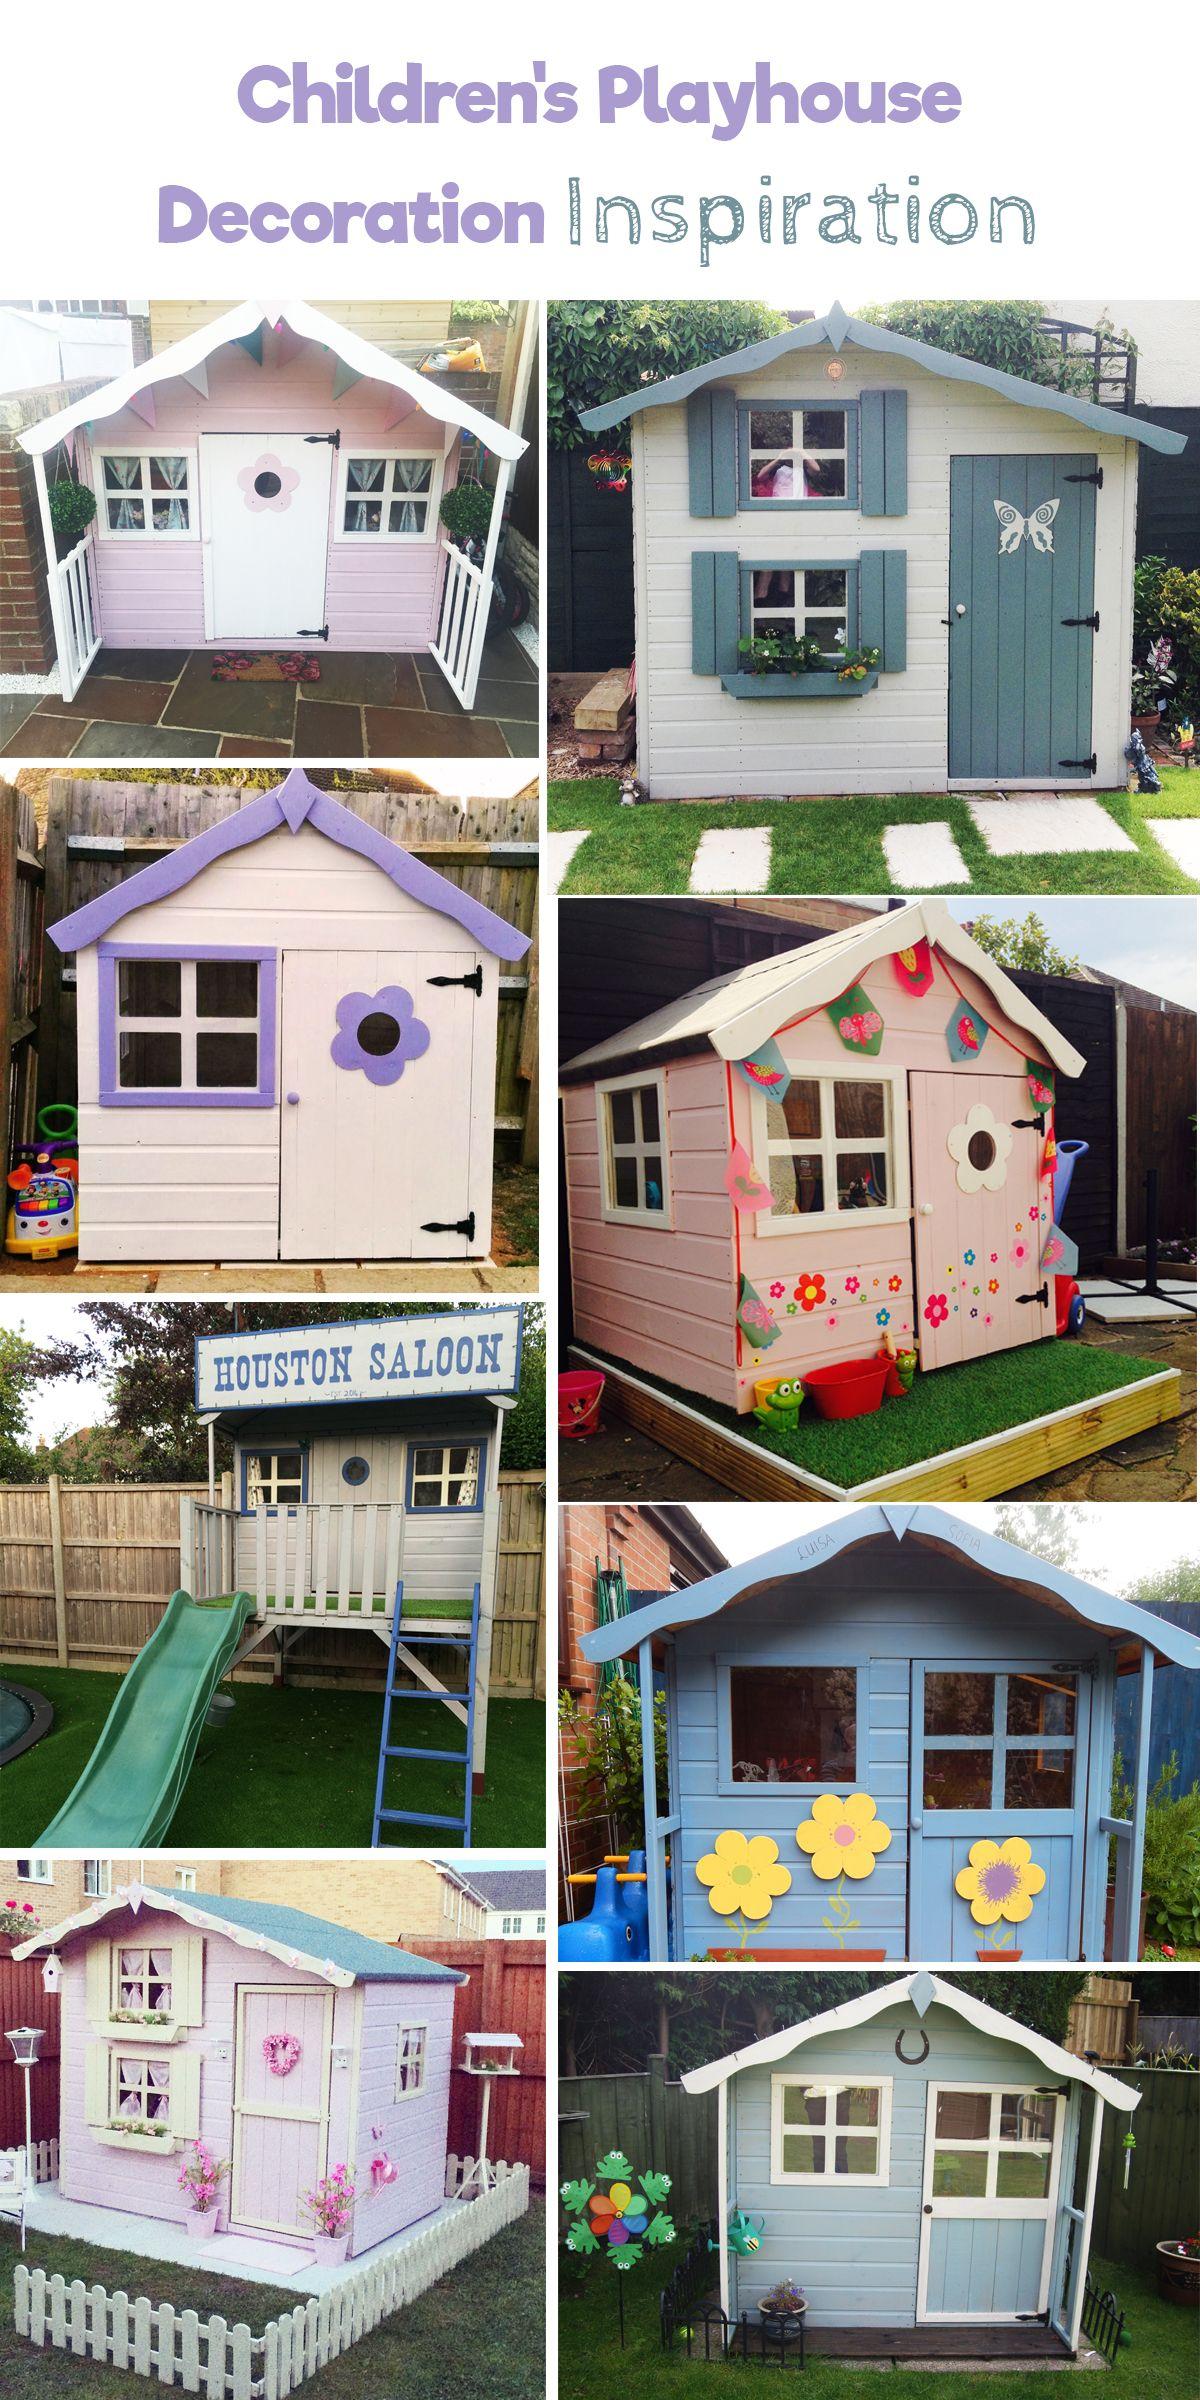 DIY: Girls and Boys Playhouse Designs For Backyard | Playhouse ...